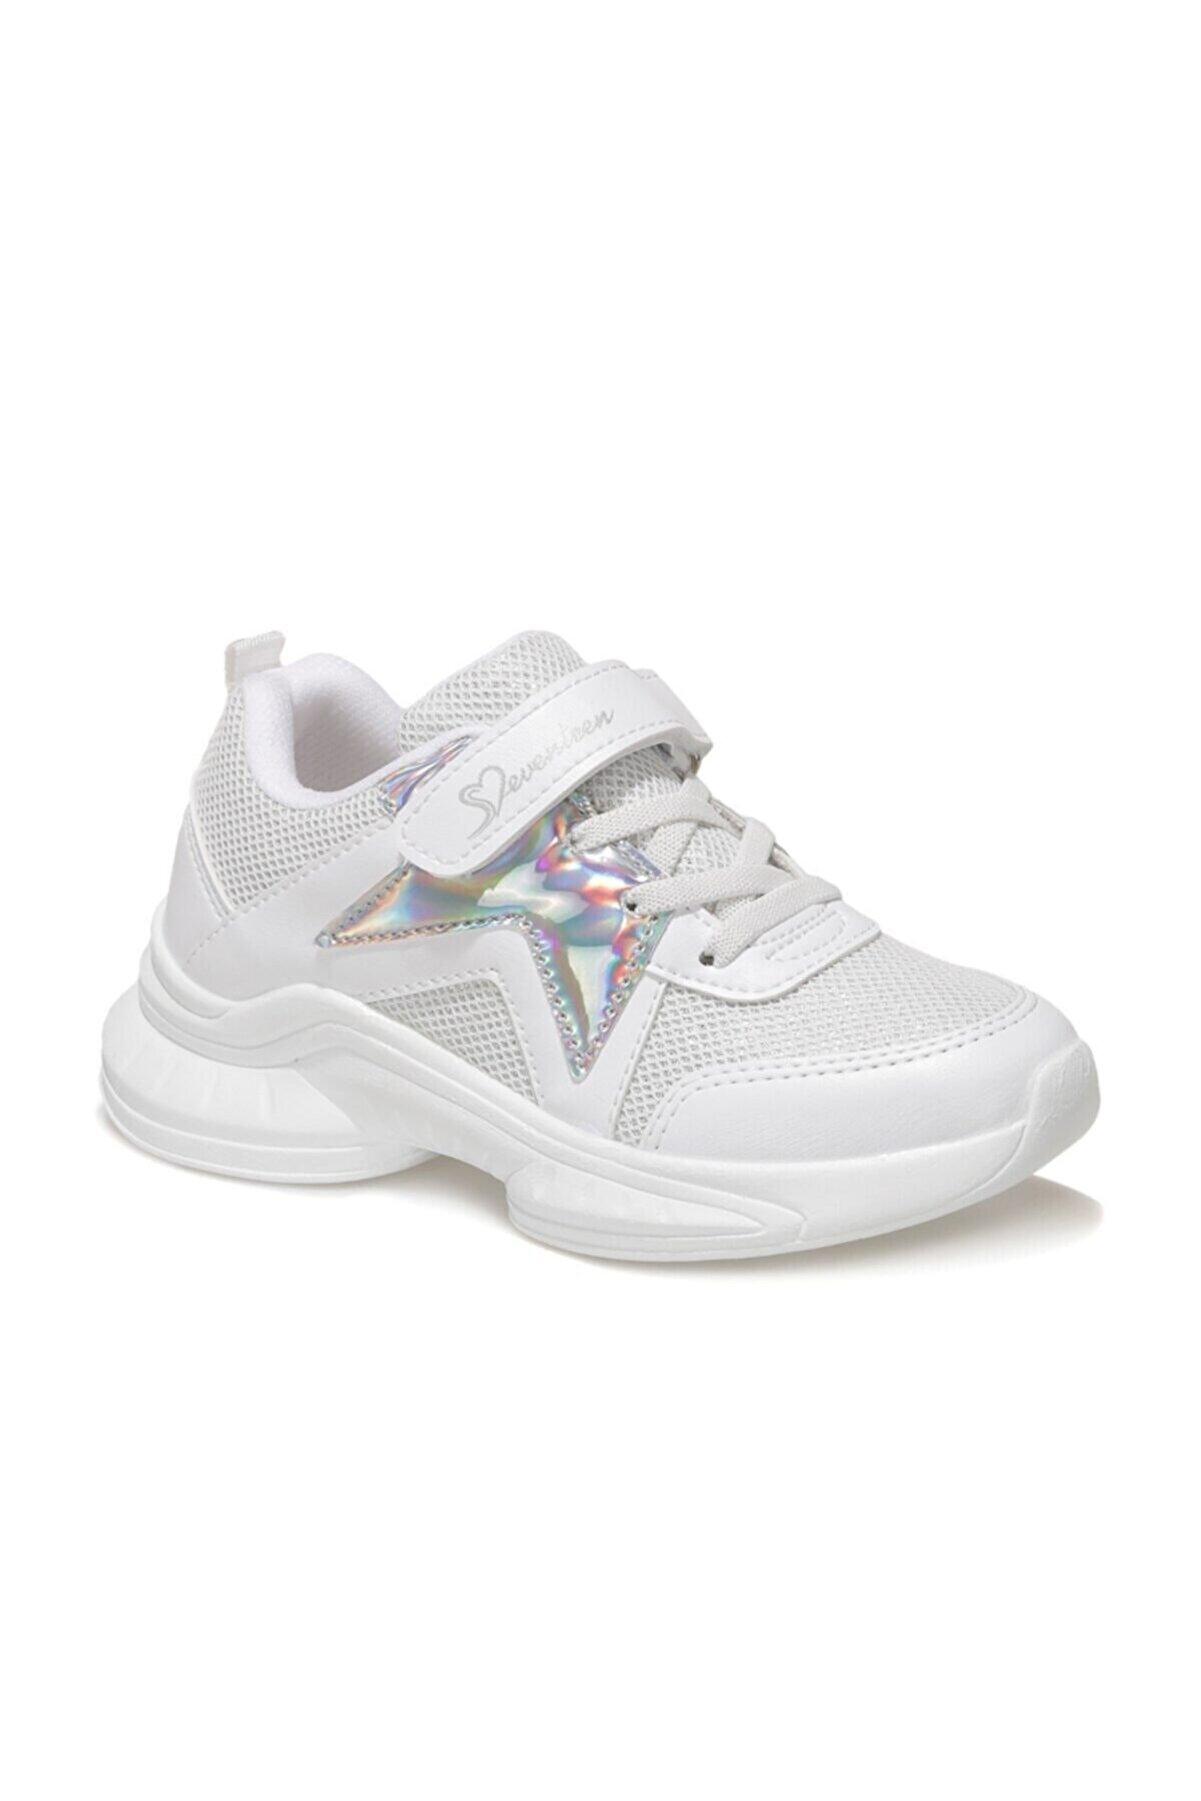 SEVENTEEN LİZO 1FX Beyaz Kız Çocuk Fashion Sneaker 101015196